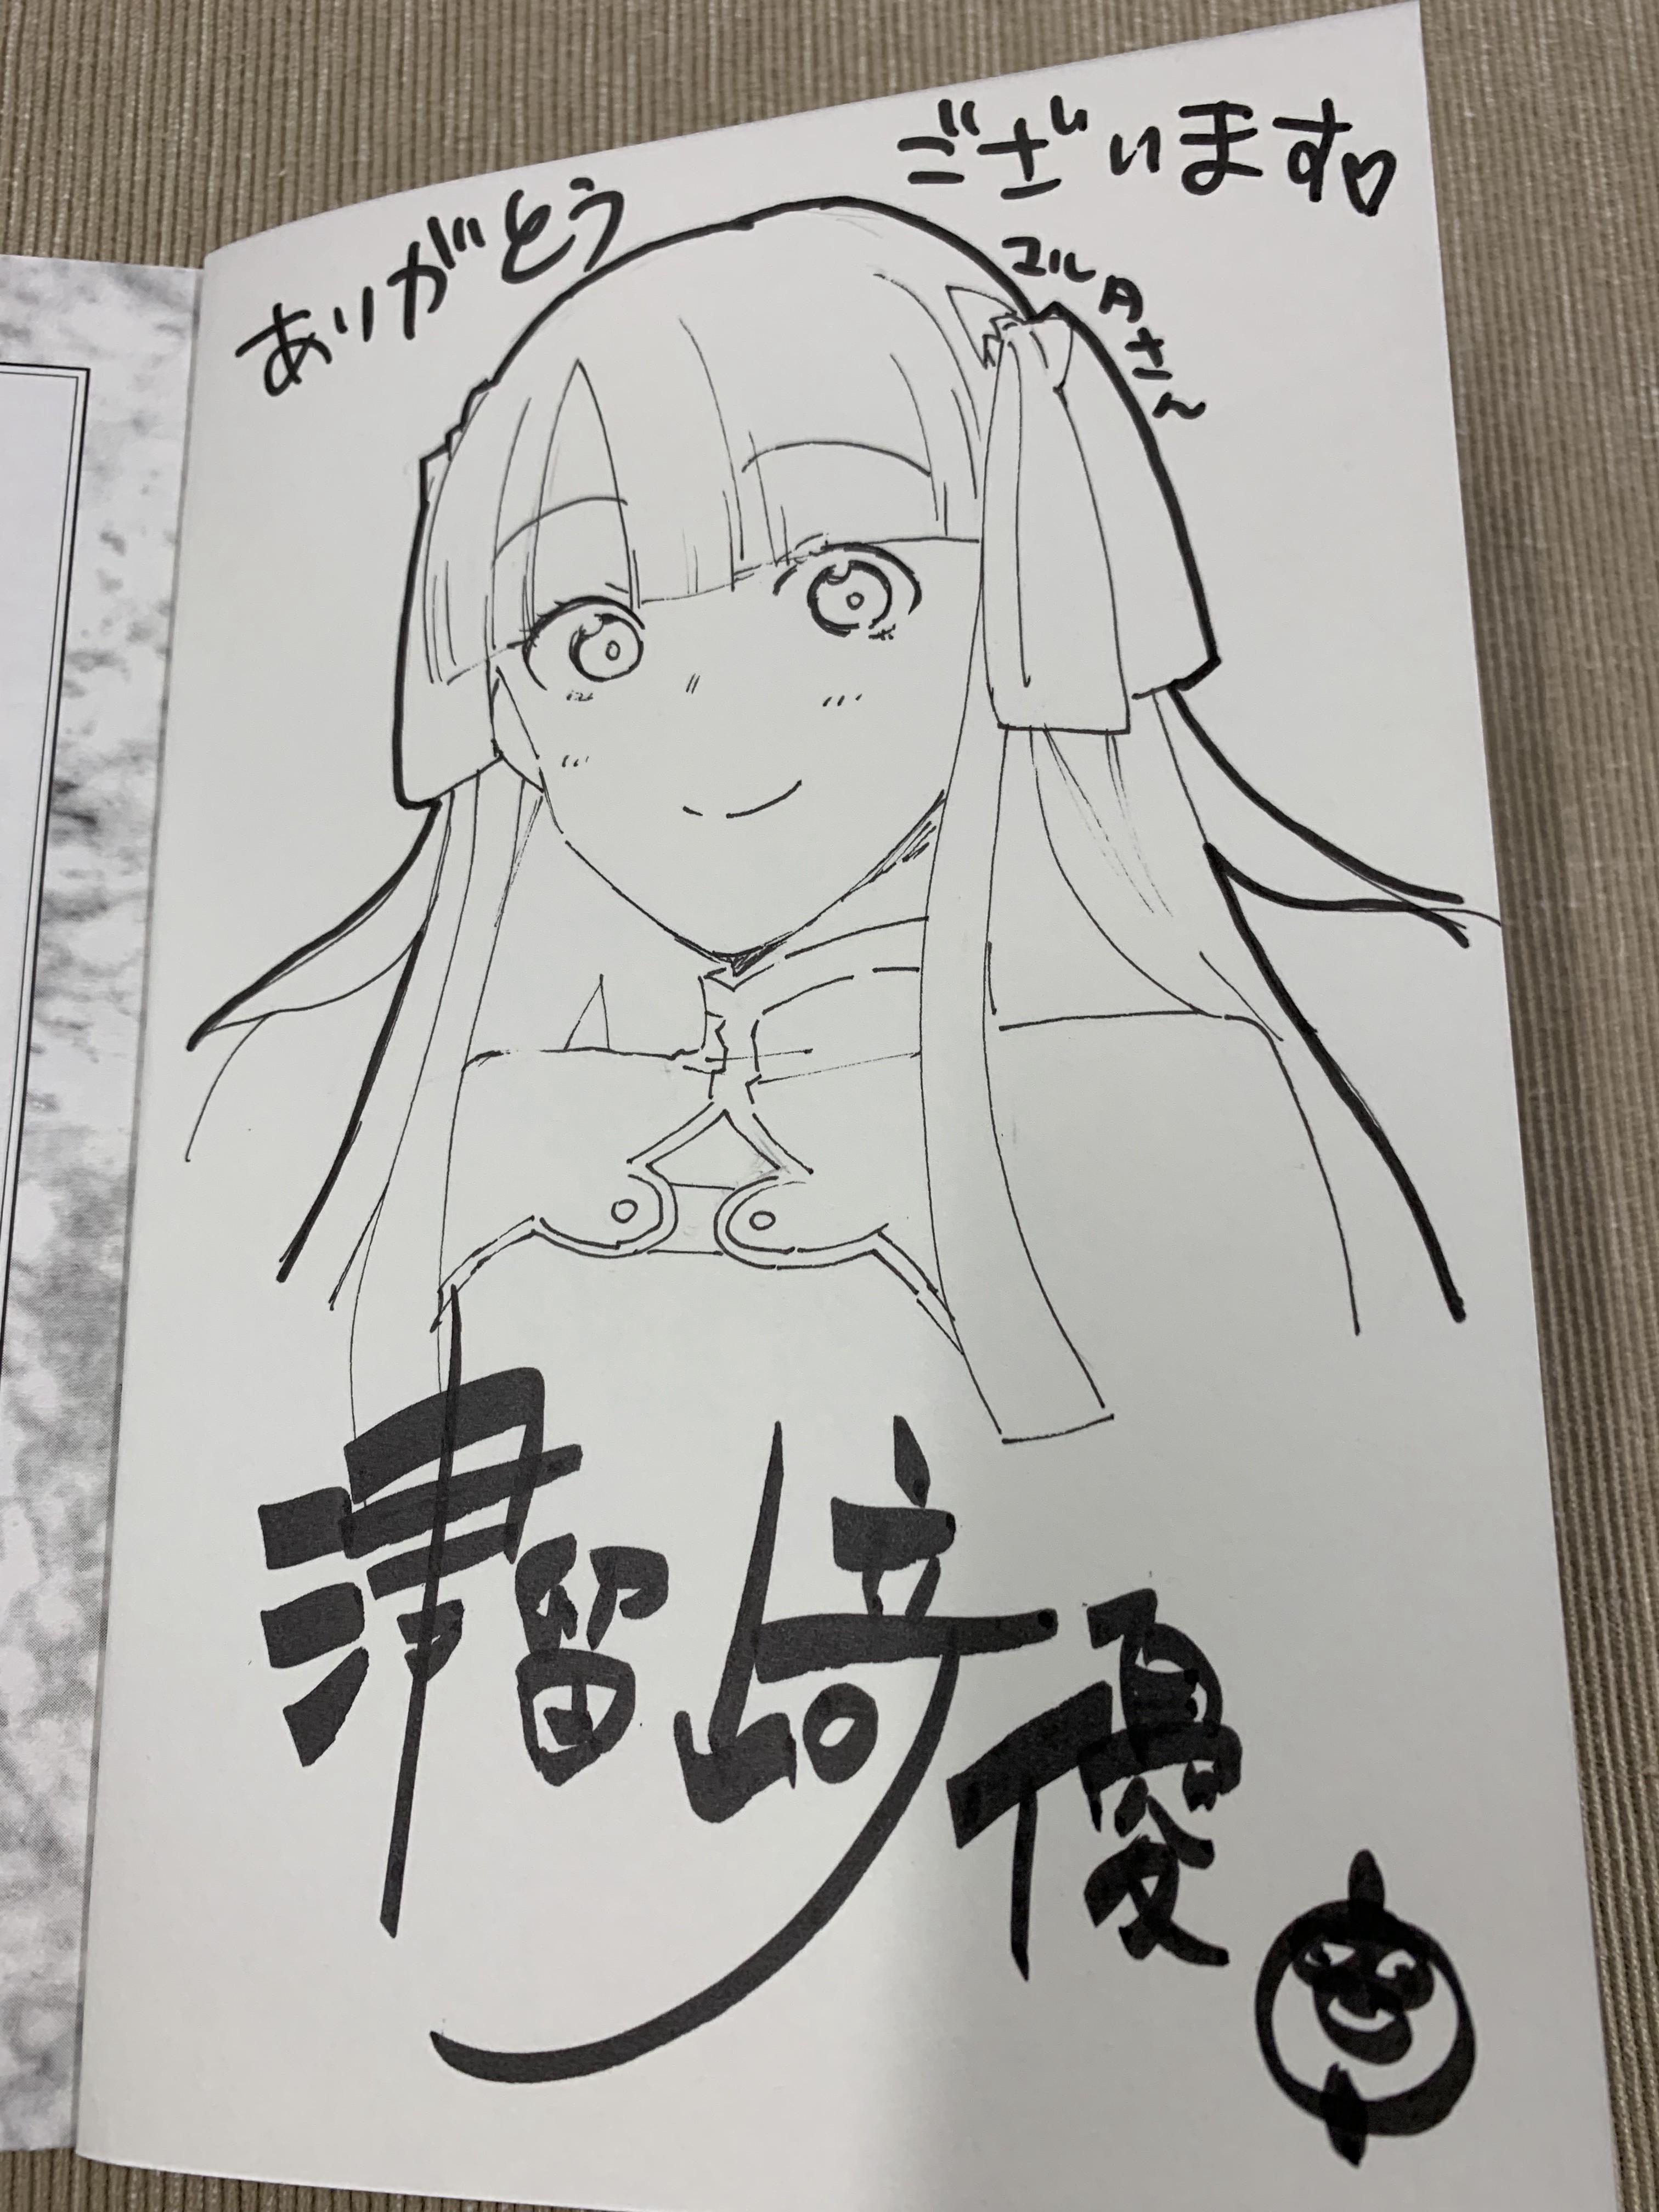 https://sai-zen-sen.jp/editors/z_oshiete_3_IMG_0991.jpg